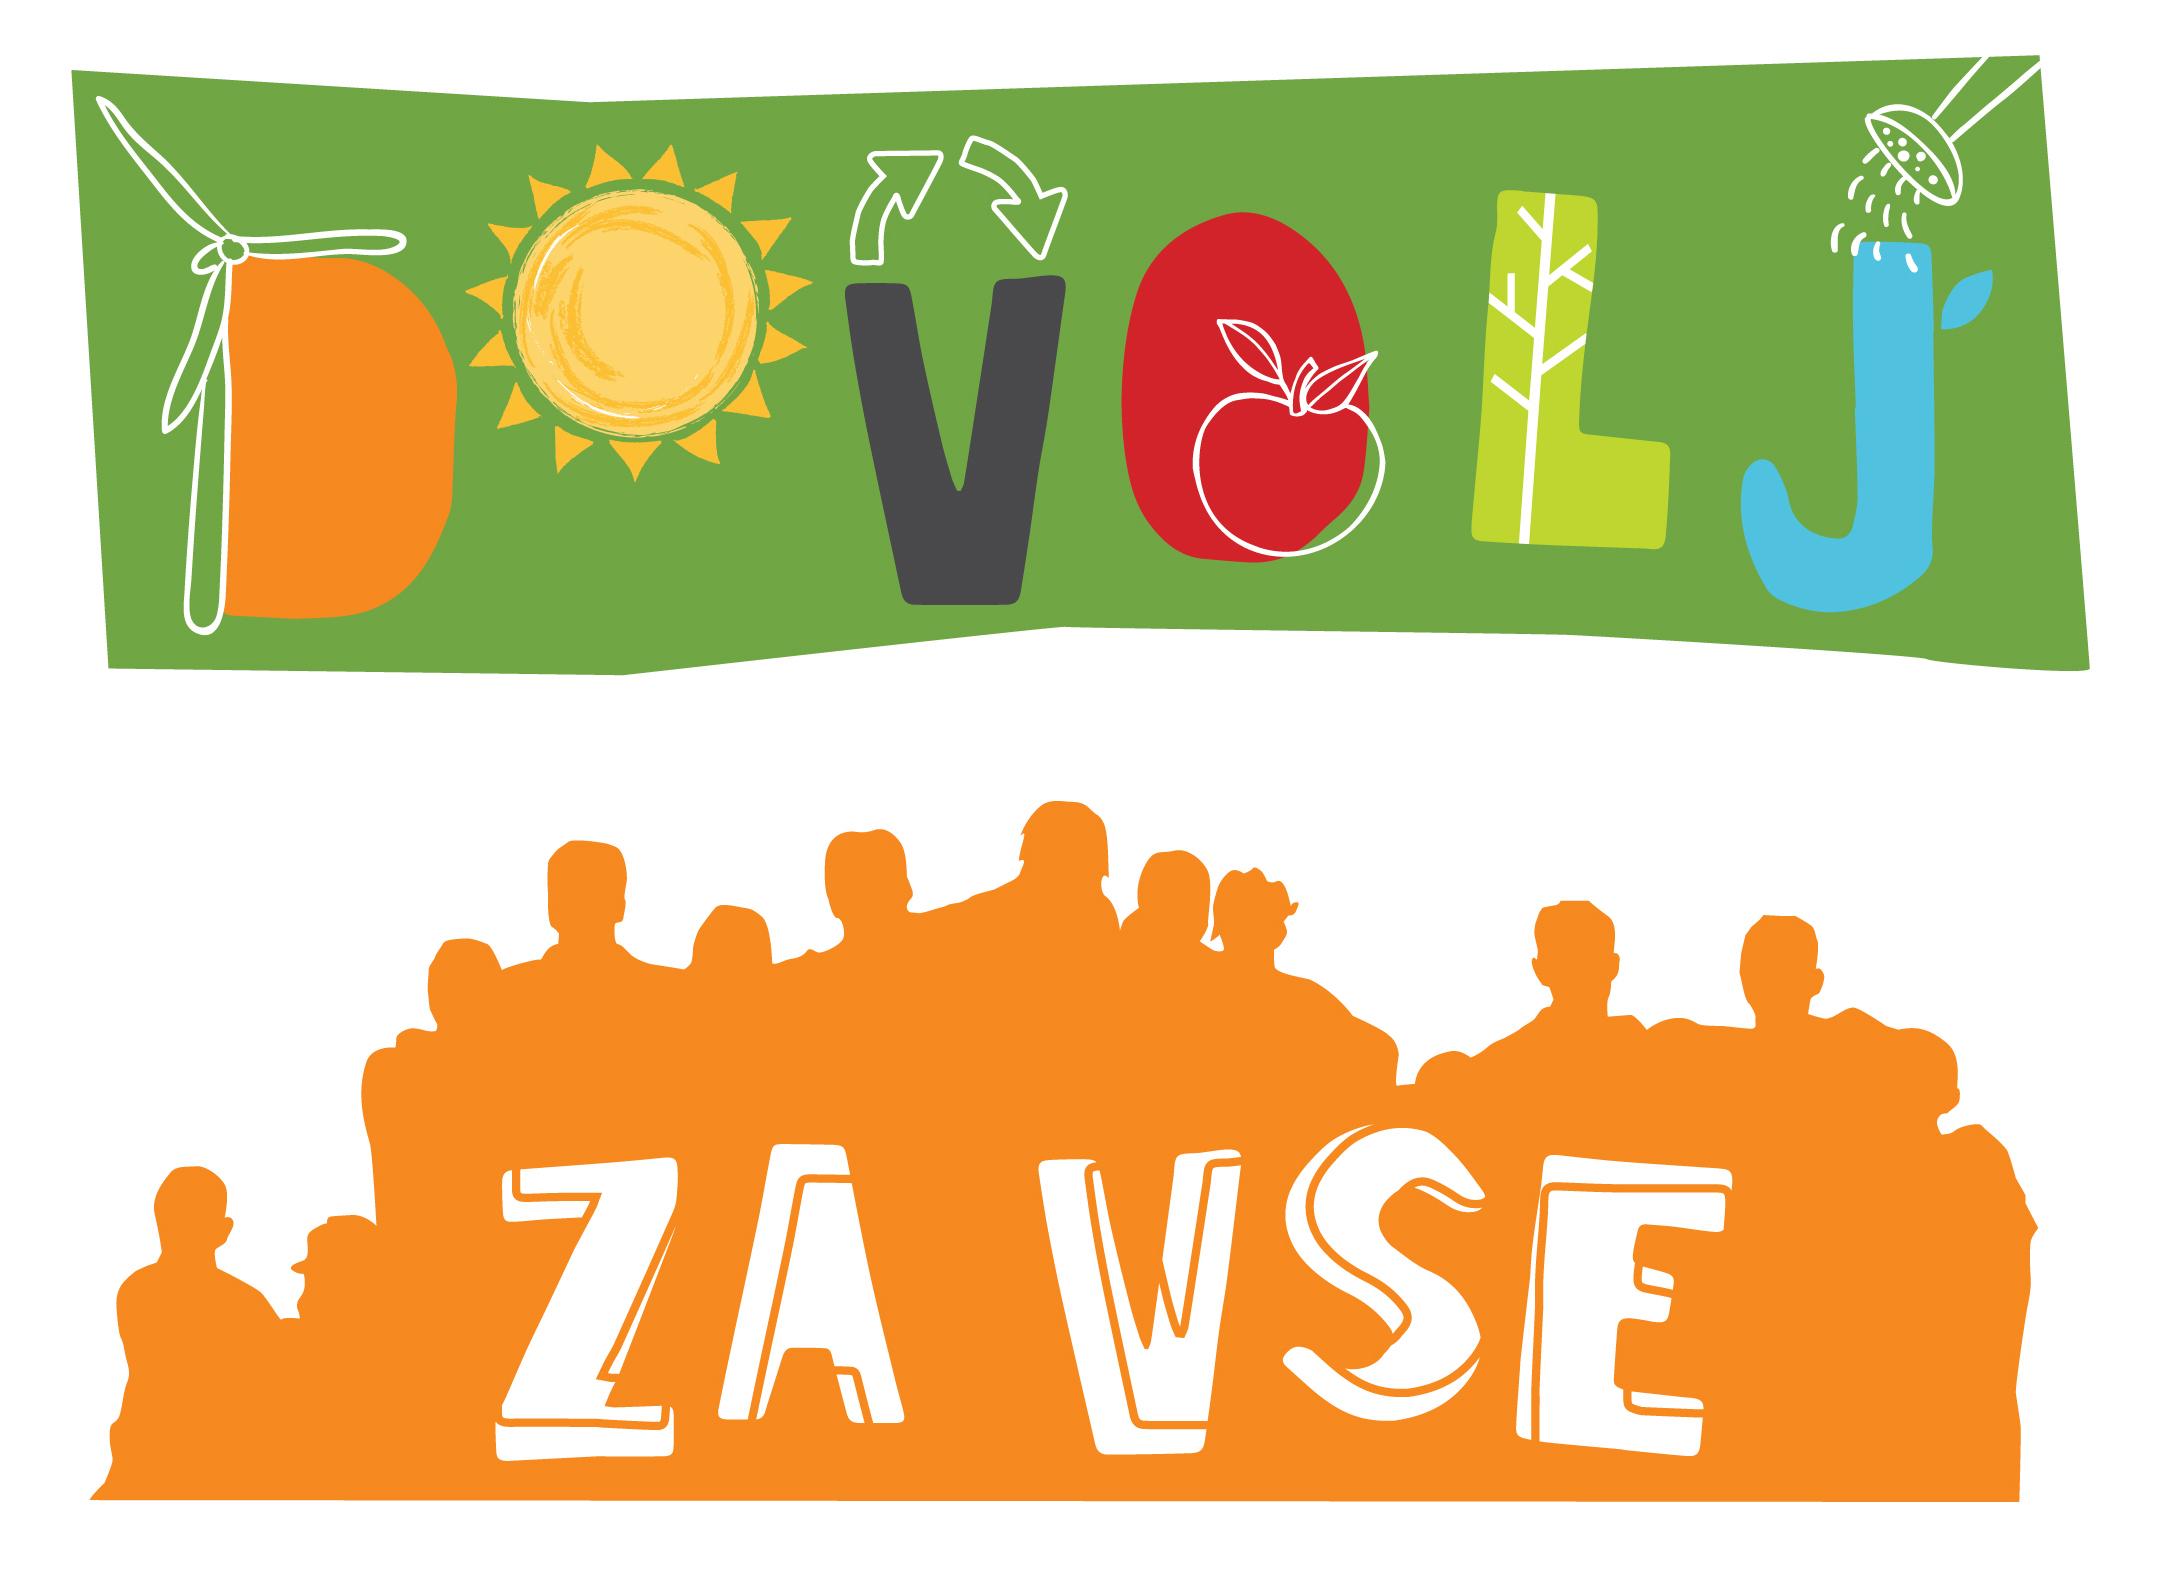 Community management of vital resources